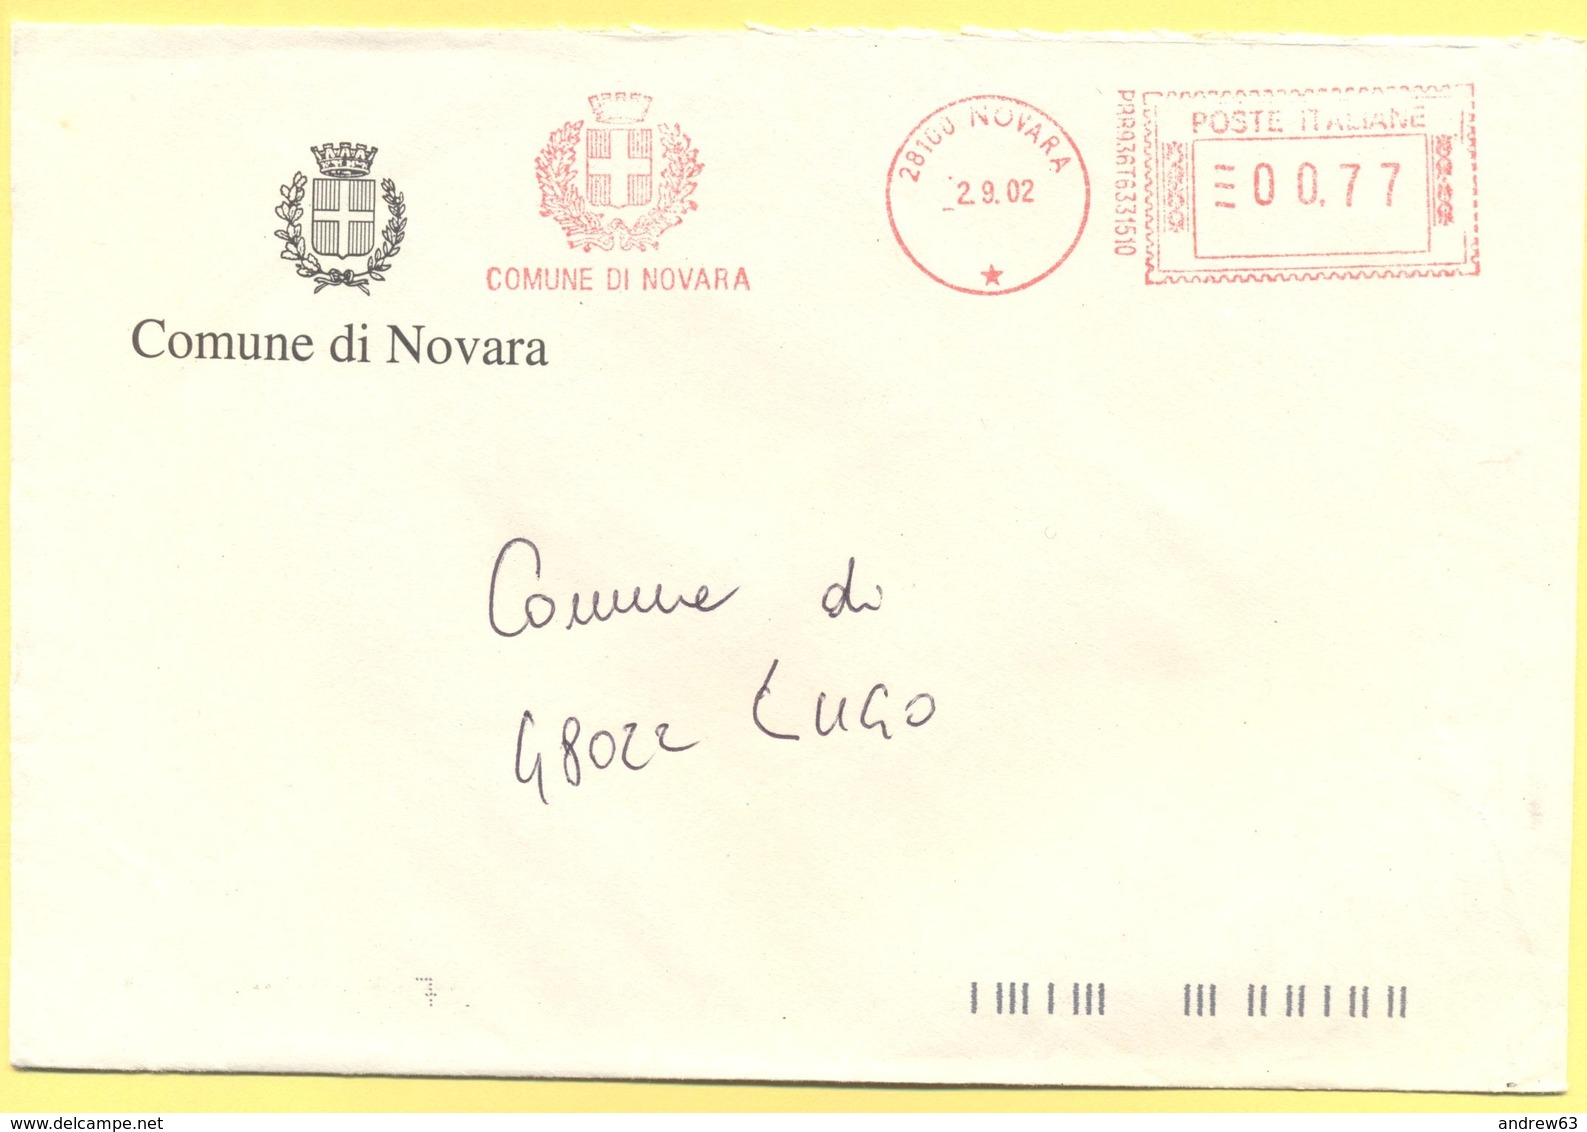 ITALIA - ITALY - ITALIE - 2002 - 00,77 EMA, Red Cancel - Comune Di Novara - Viaggiata Da Novara Per Lugo - Affrancature Meccaniche Rosse (EMA)